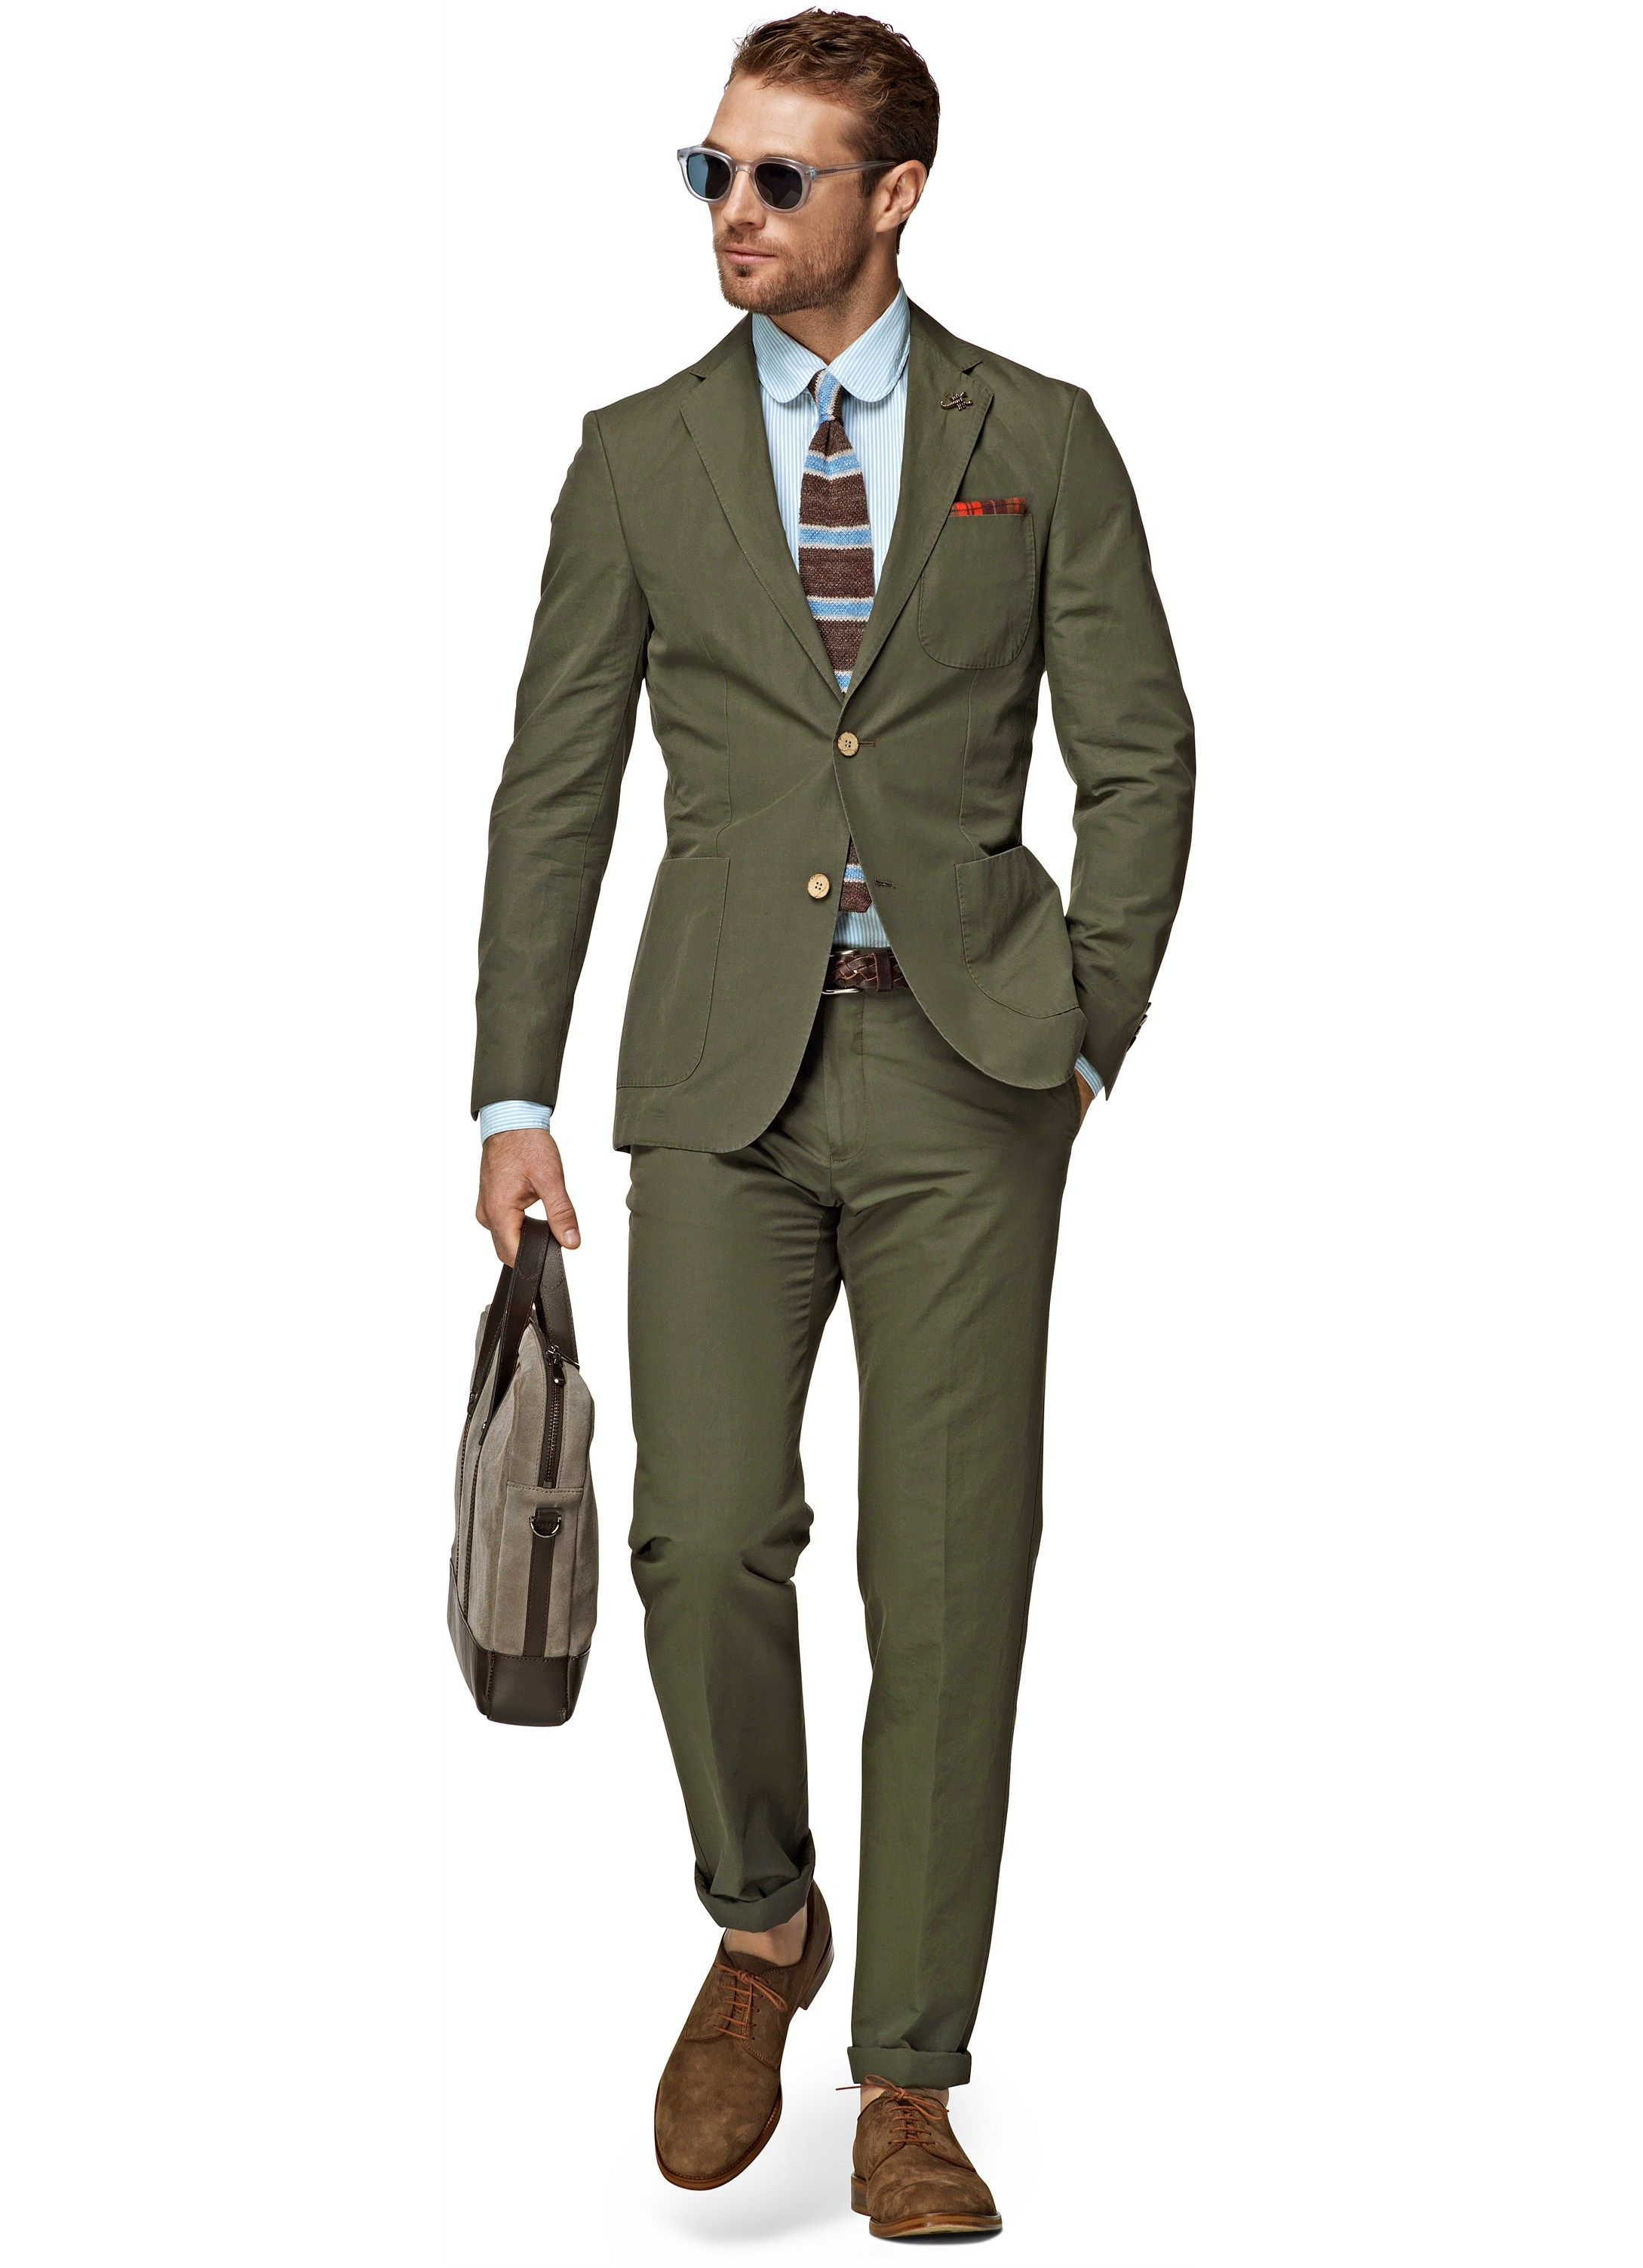 Suit Supply COPENHAGEN GREEN PLAIN  a53e0764777